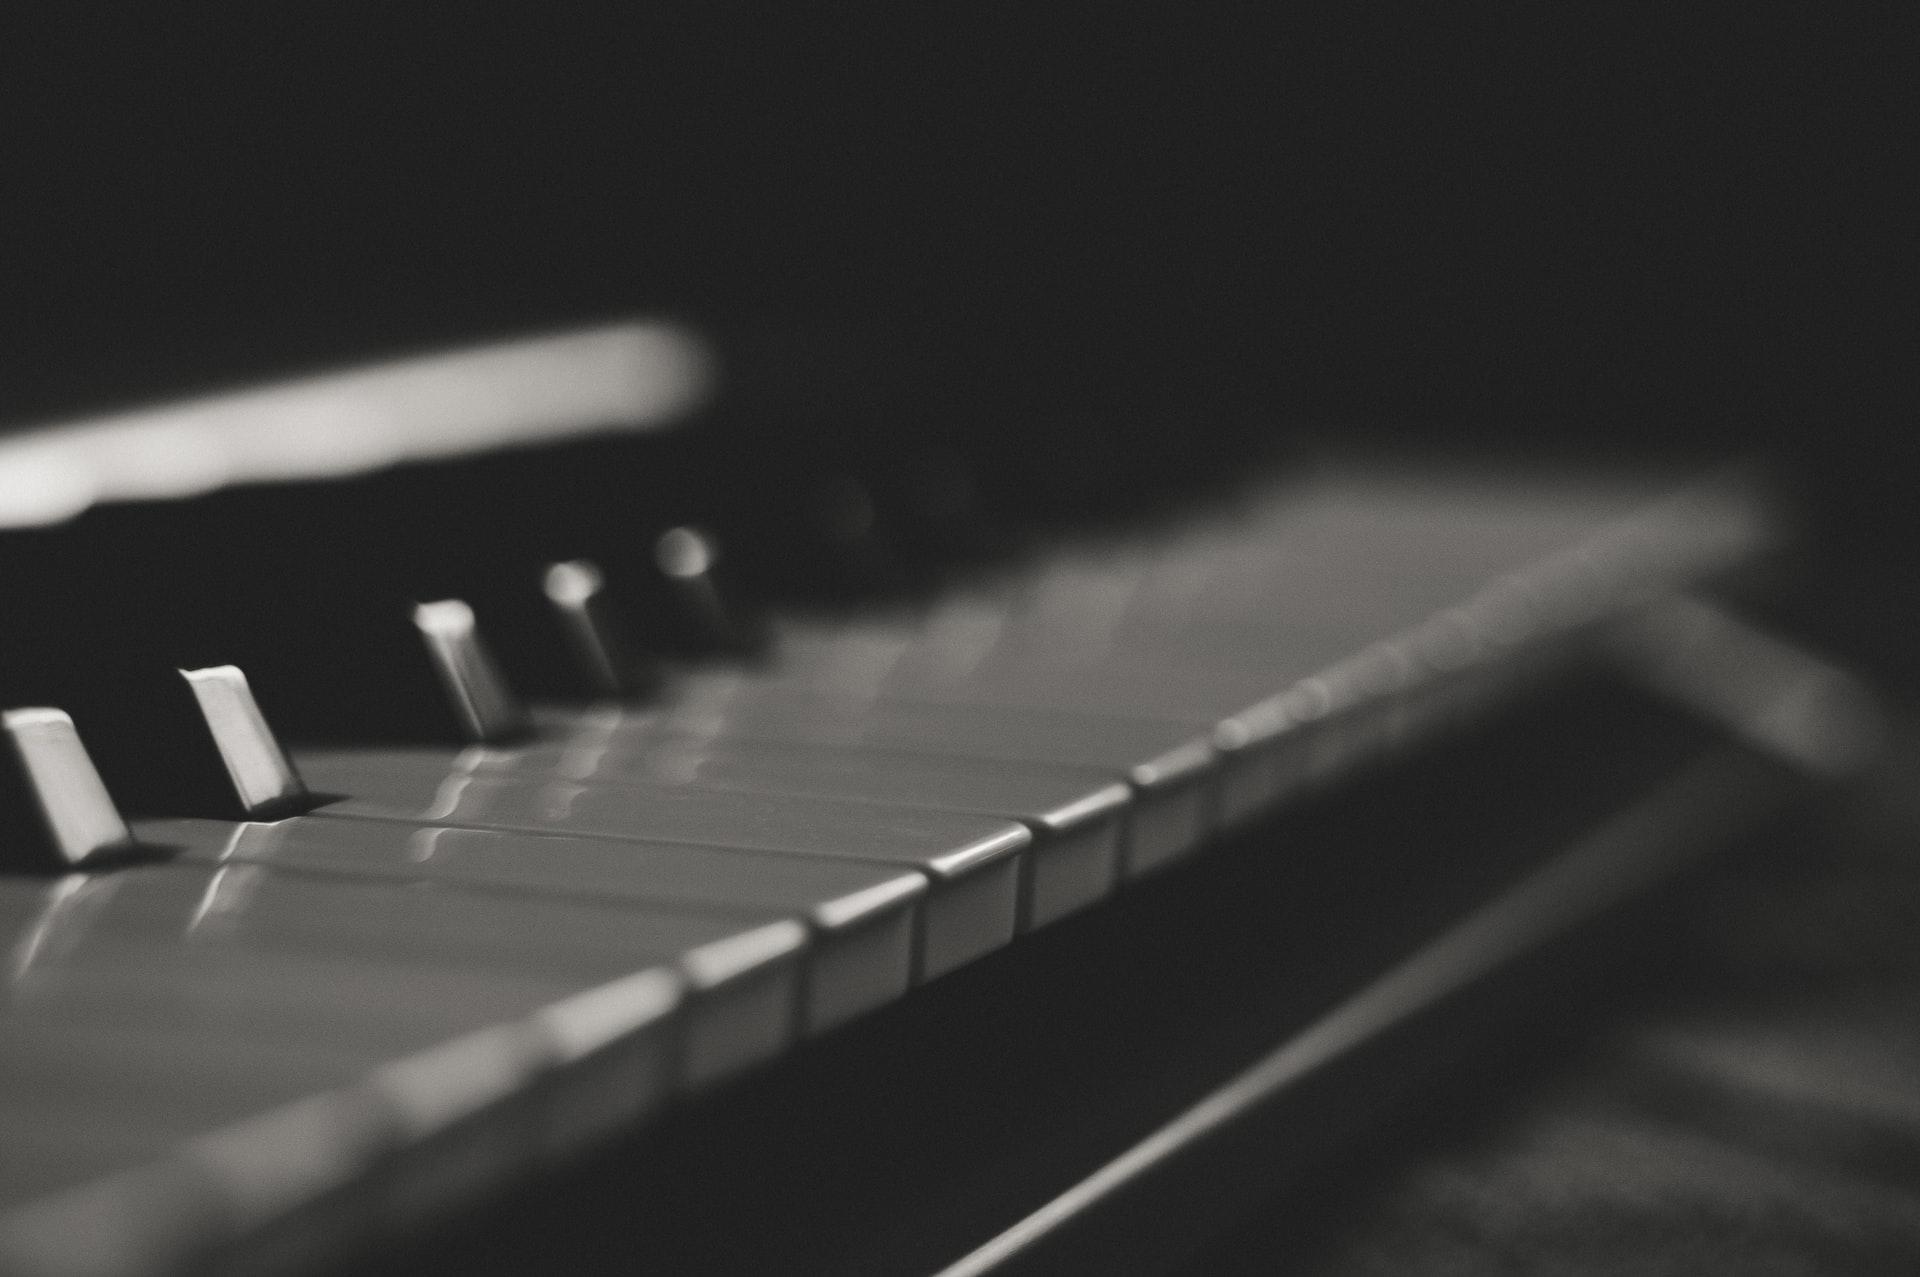 leonardo da vinci musica